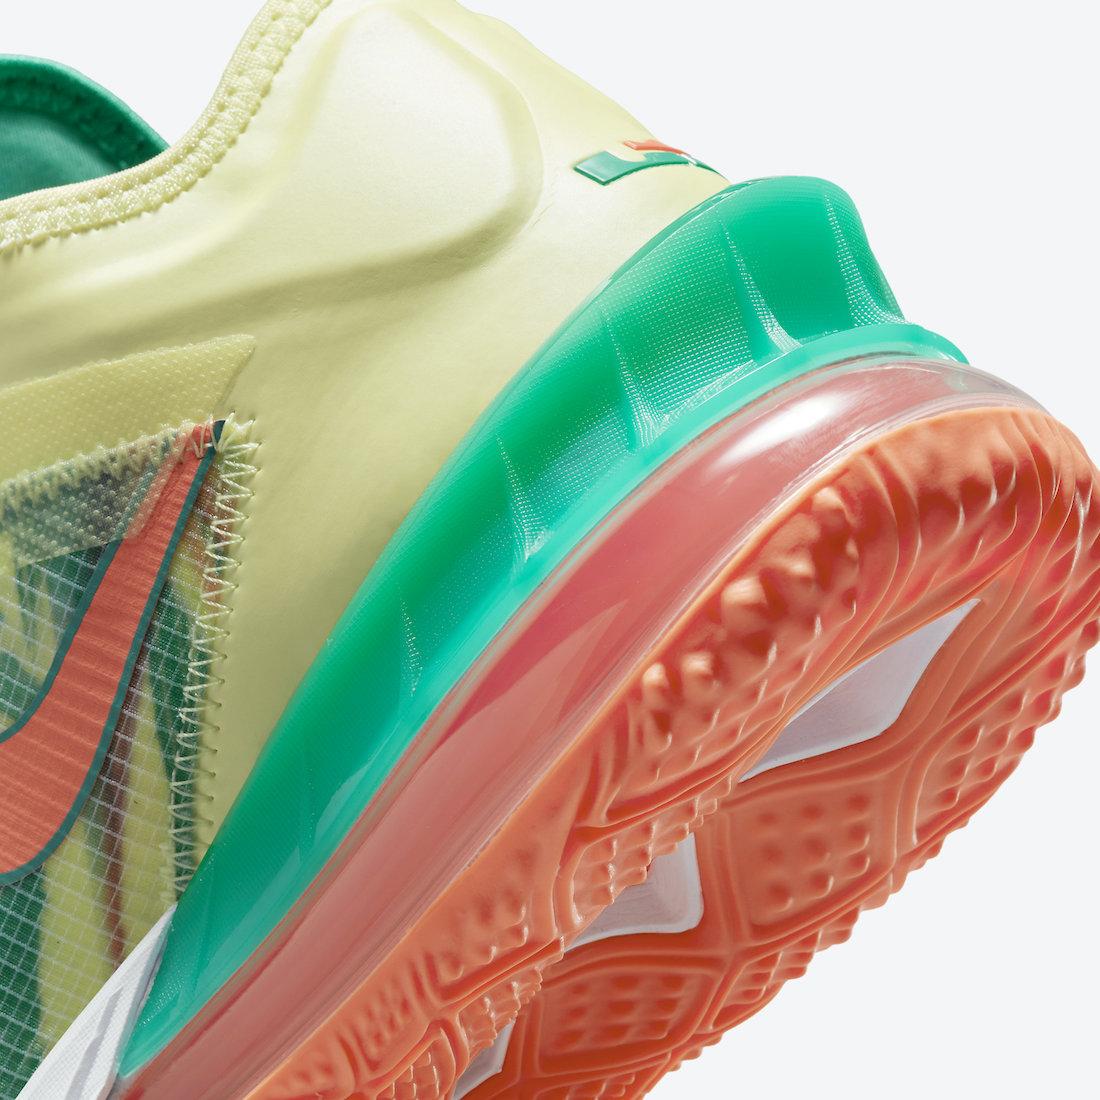 Nike-LeBron-18-Low-LeBronold-Palmer-CV7562-300-Release-Date-7